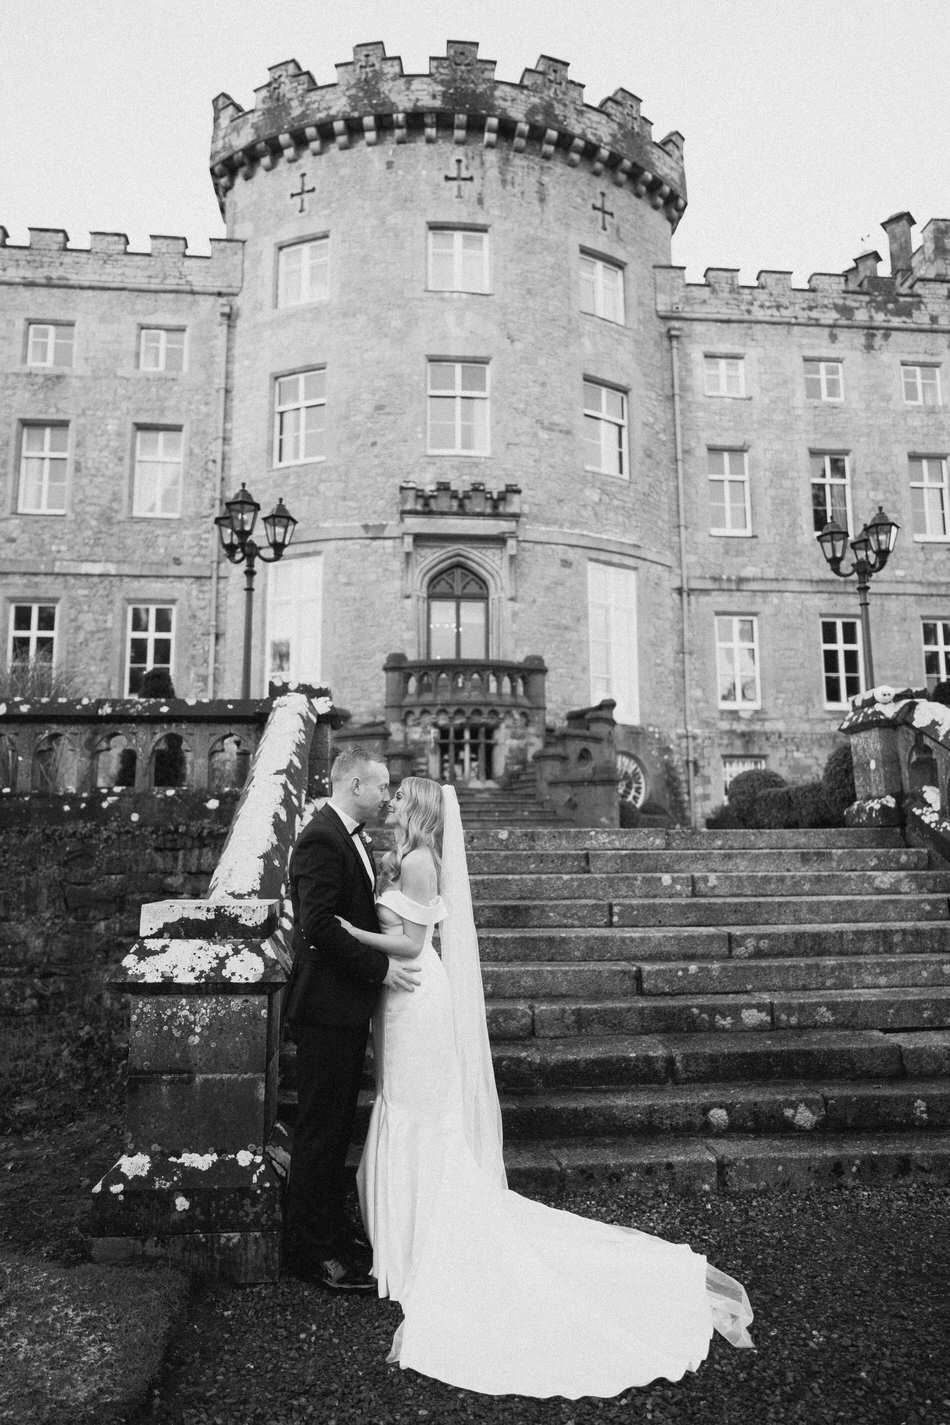 Castle-wedding-ireland-photos- 0191 136